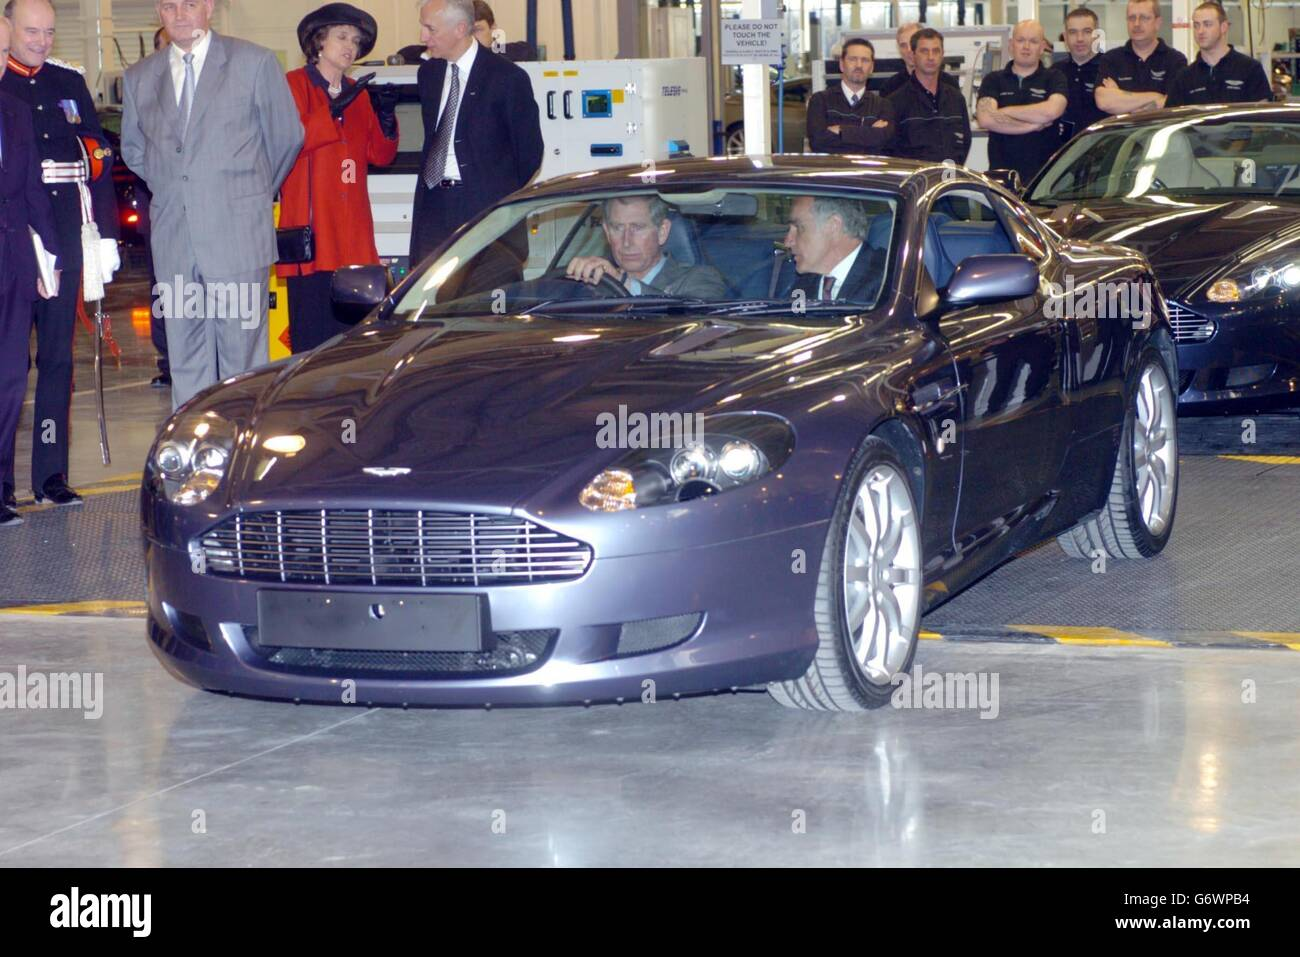 Aston Martin Stock >> The Prince Of Wales Drives A New Aston Martin Stock Photo